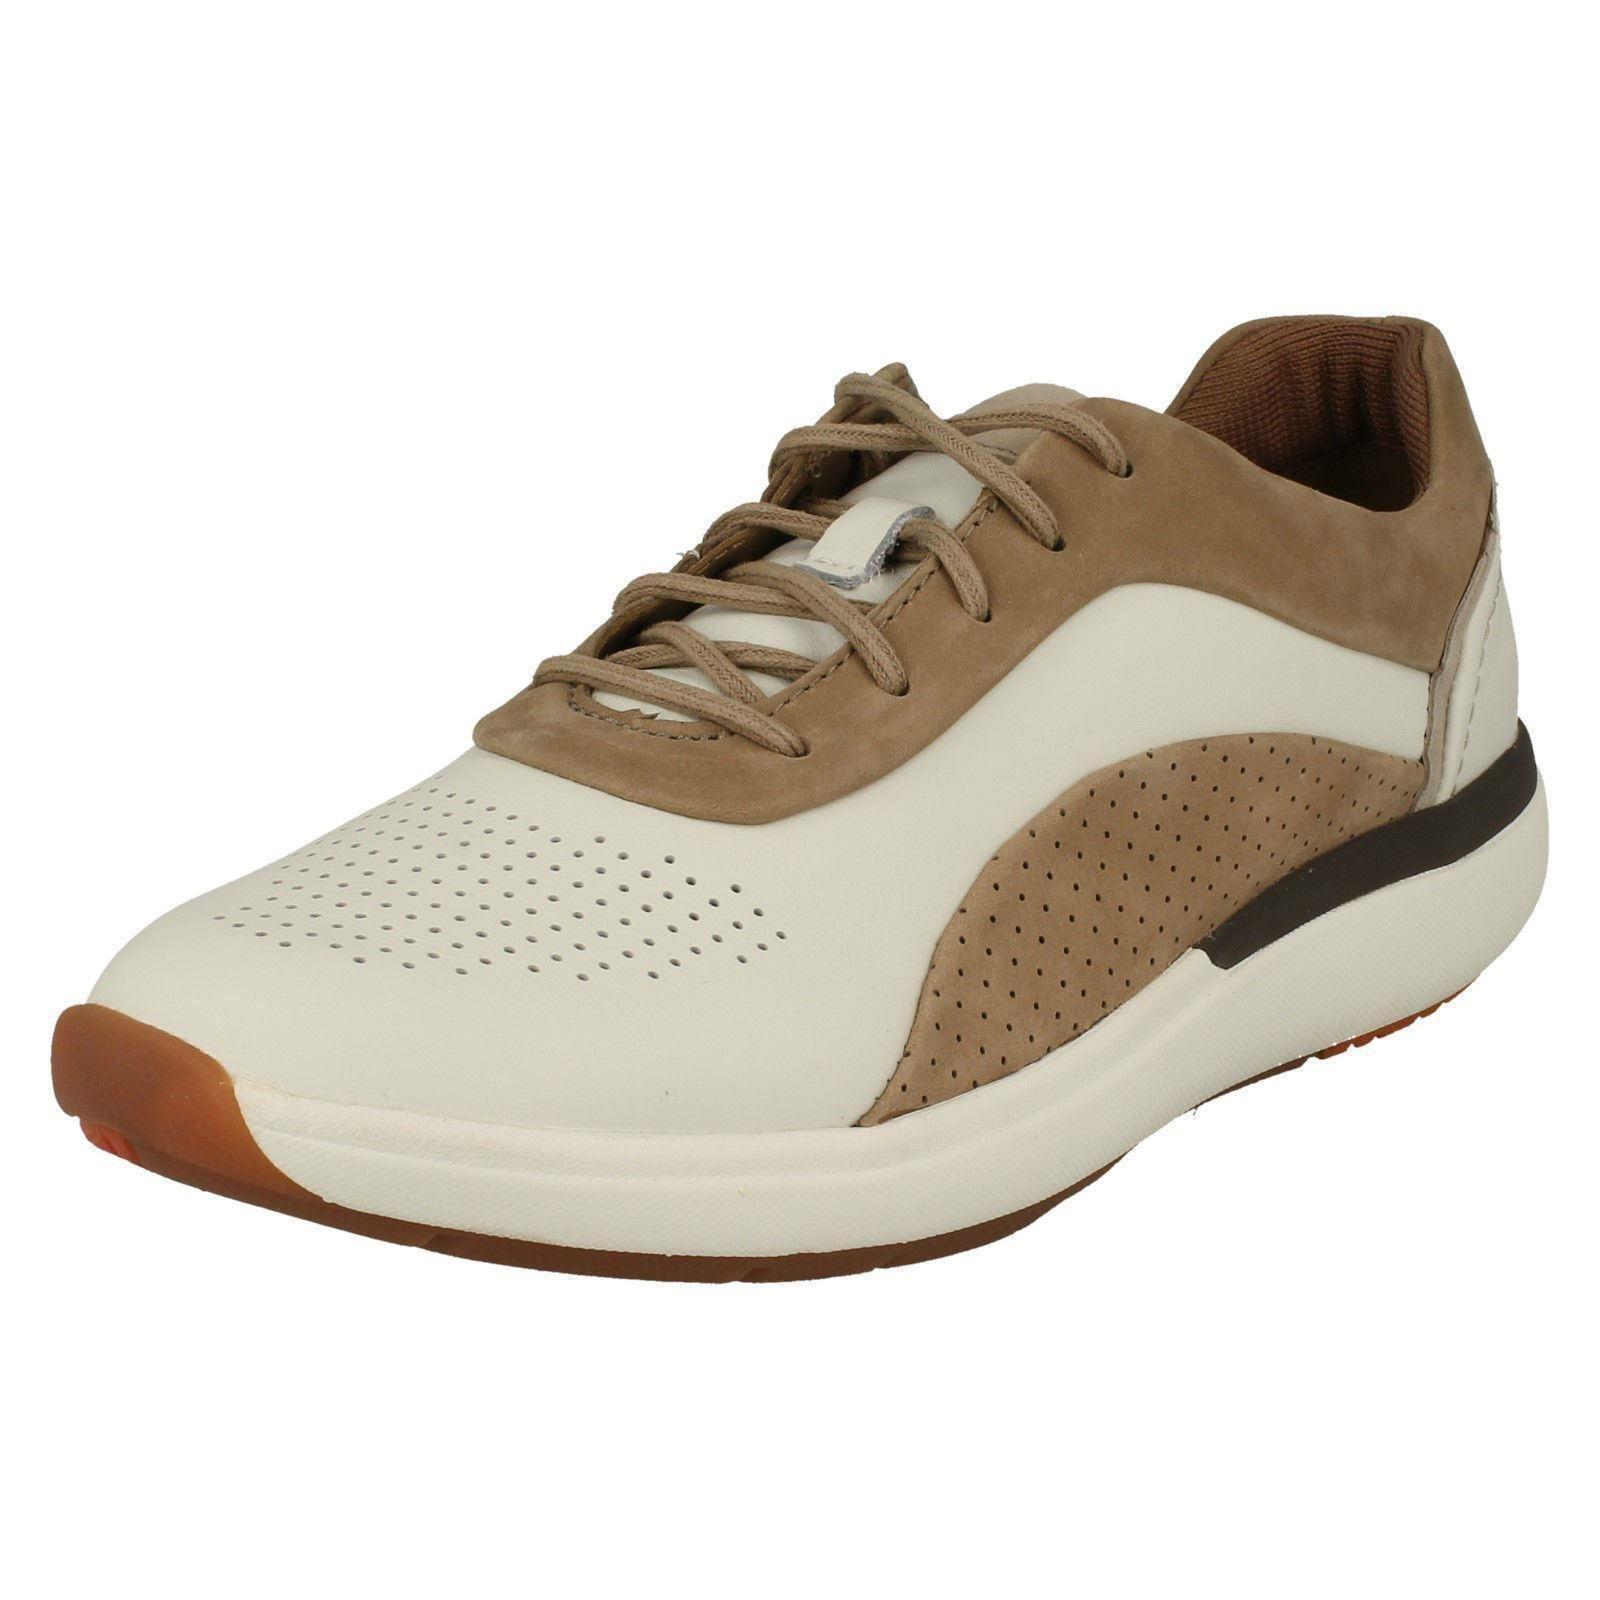 f9d38ed1c50 ... Nike Lebron Soldier XI SFG EP 11 Light Bone Bone Bone James Men  Basketball 897647- ...